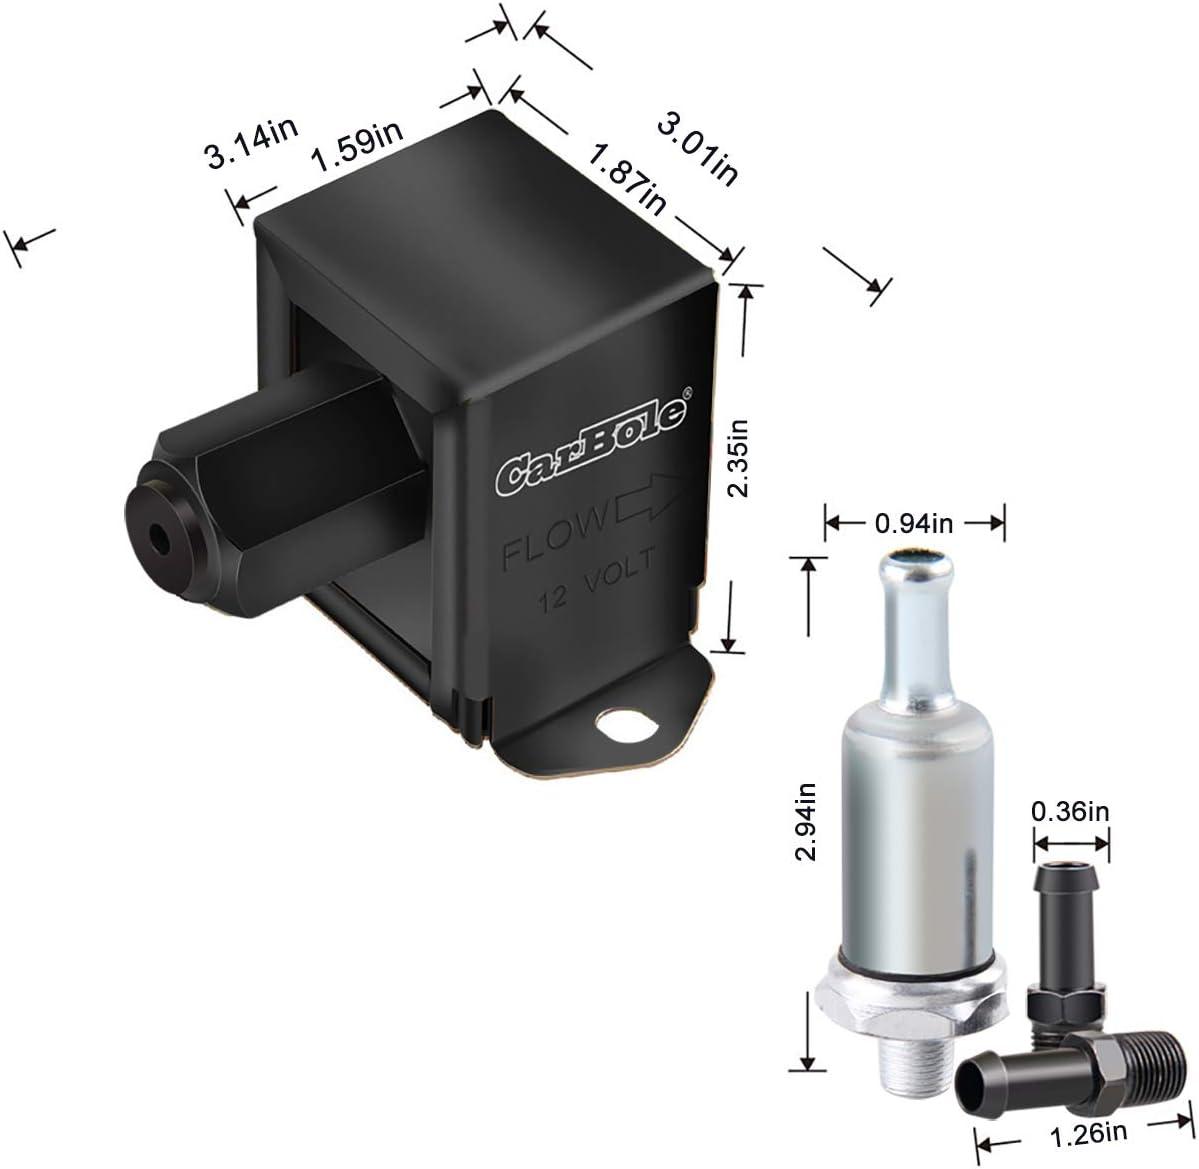 12V 4-7 PSI Niederdruck Inline Kraftstoffpumpe Diesel Benzin Universal HEP02A Elektrische Kraftstoffpumpe 4 PSI 4-7 PSI Messing Heavy-Duty Metall 2,5